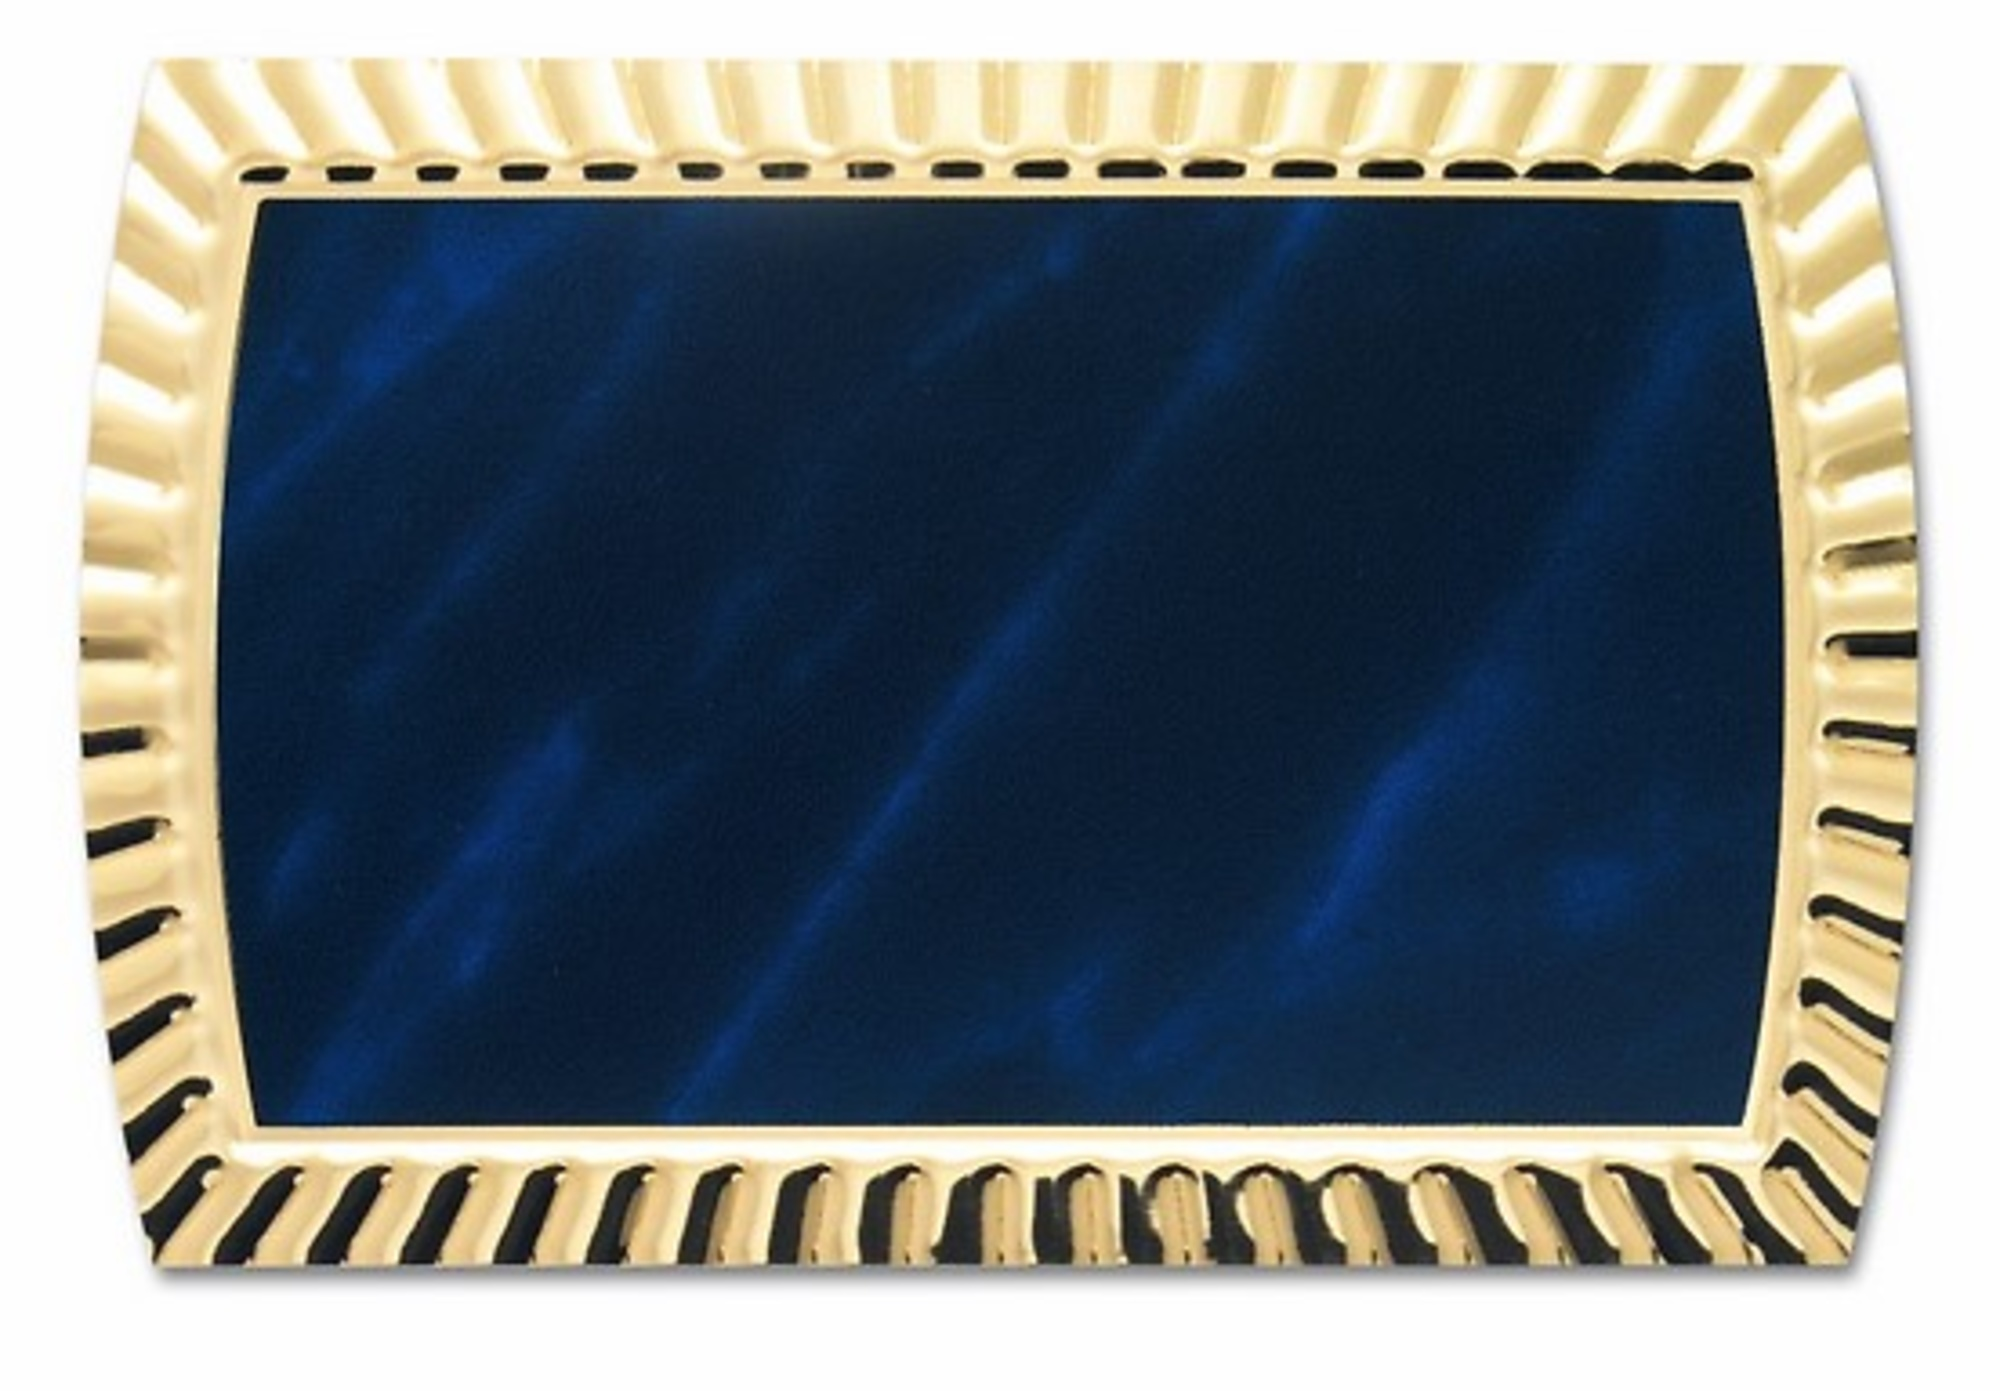 Venta de placa aluminio palencia para funeraria placas - Placas de aluminio ...